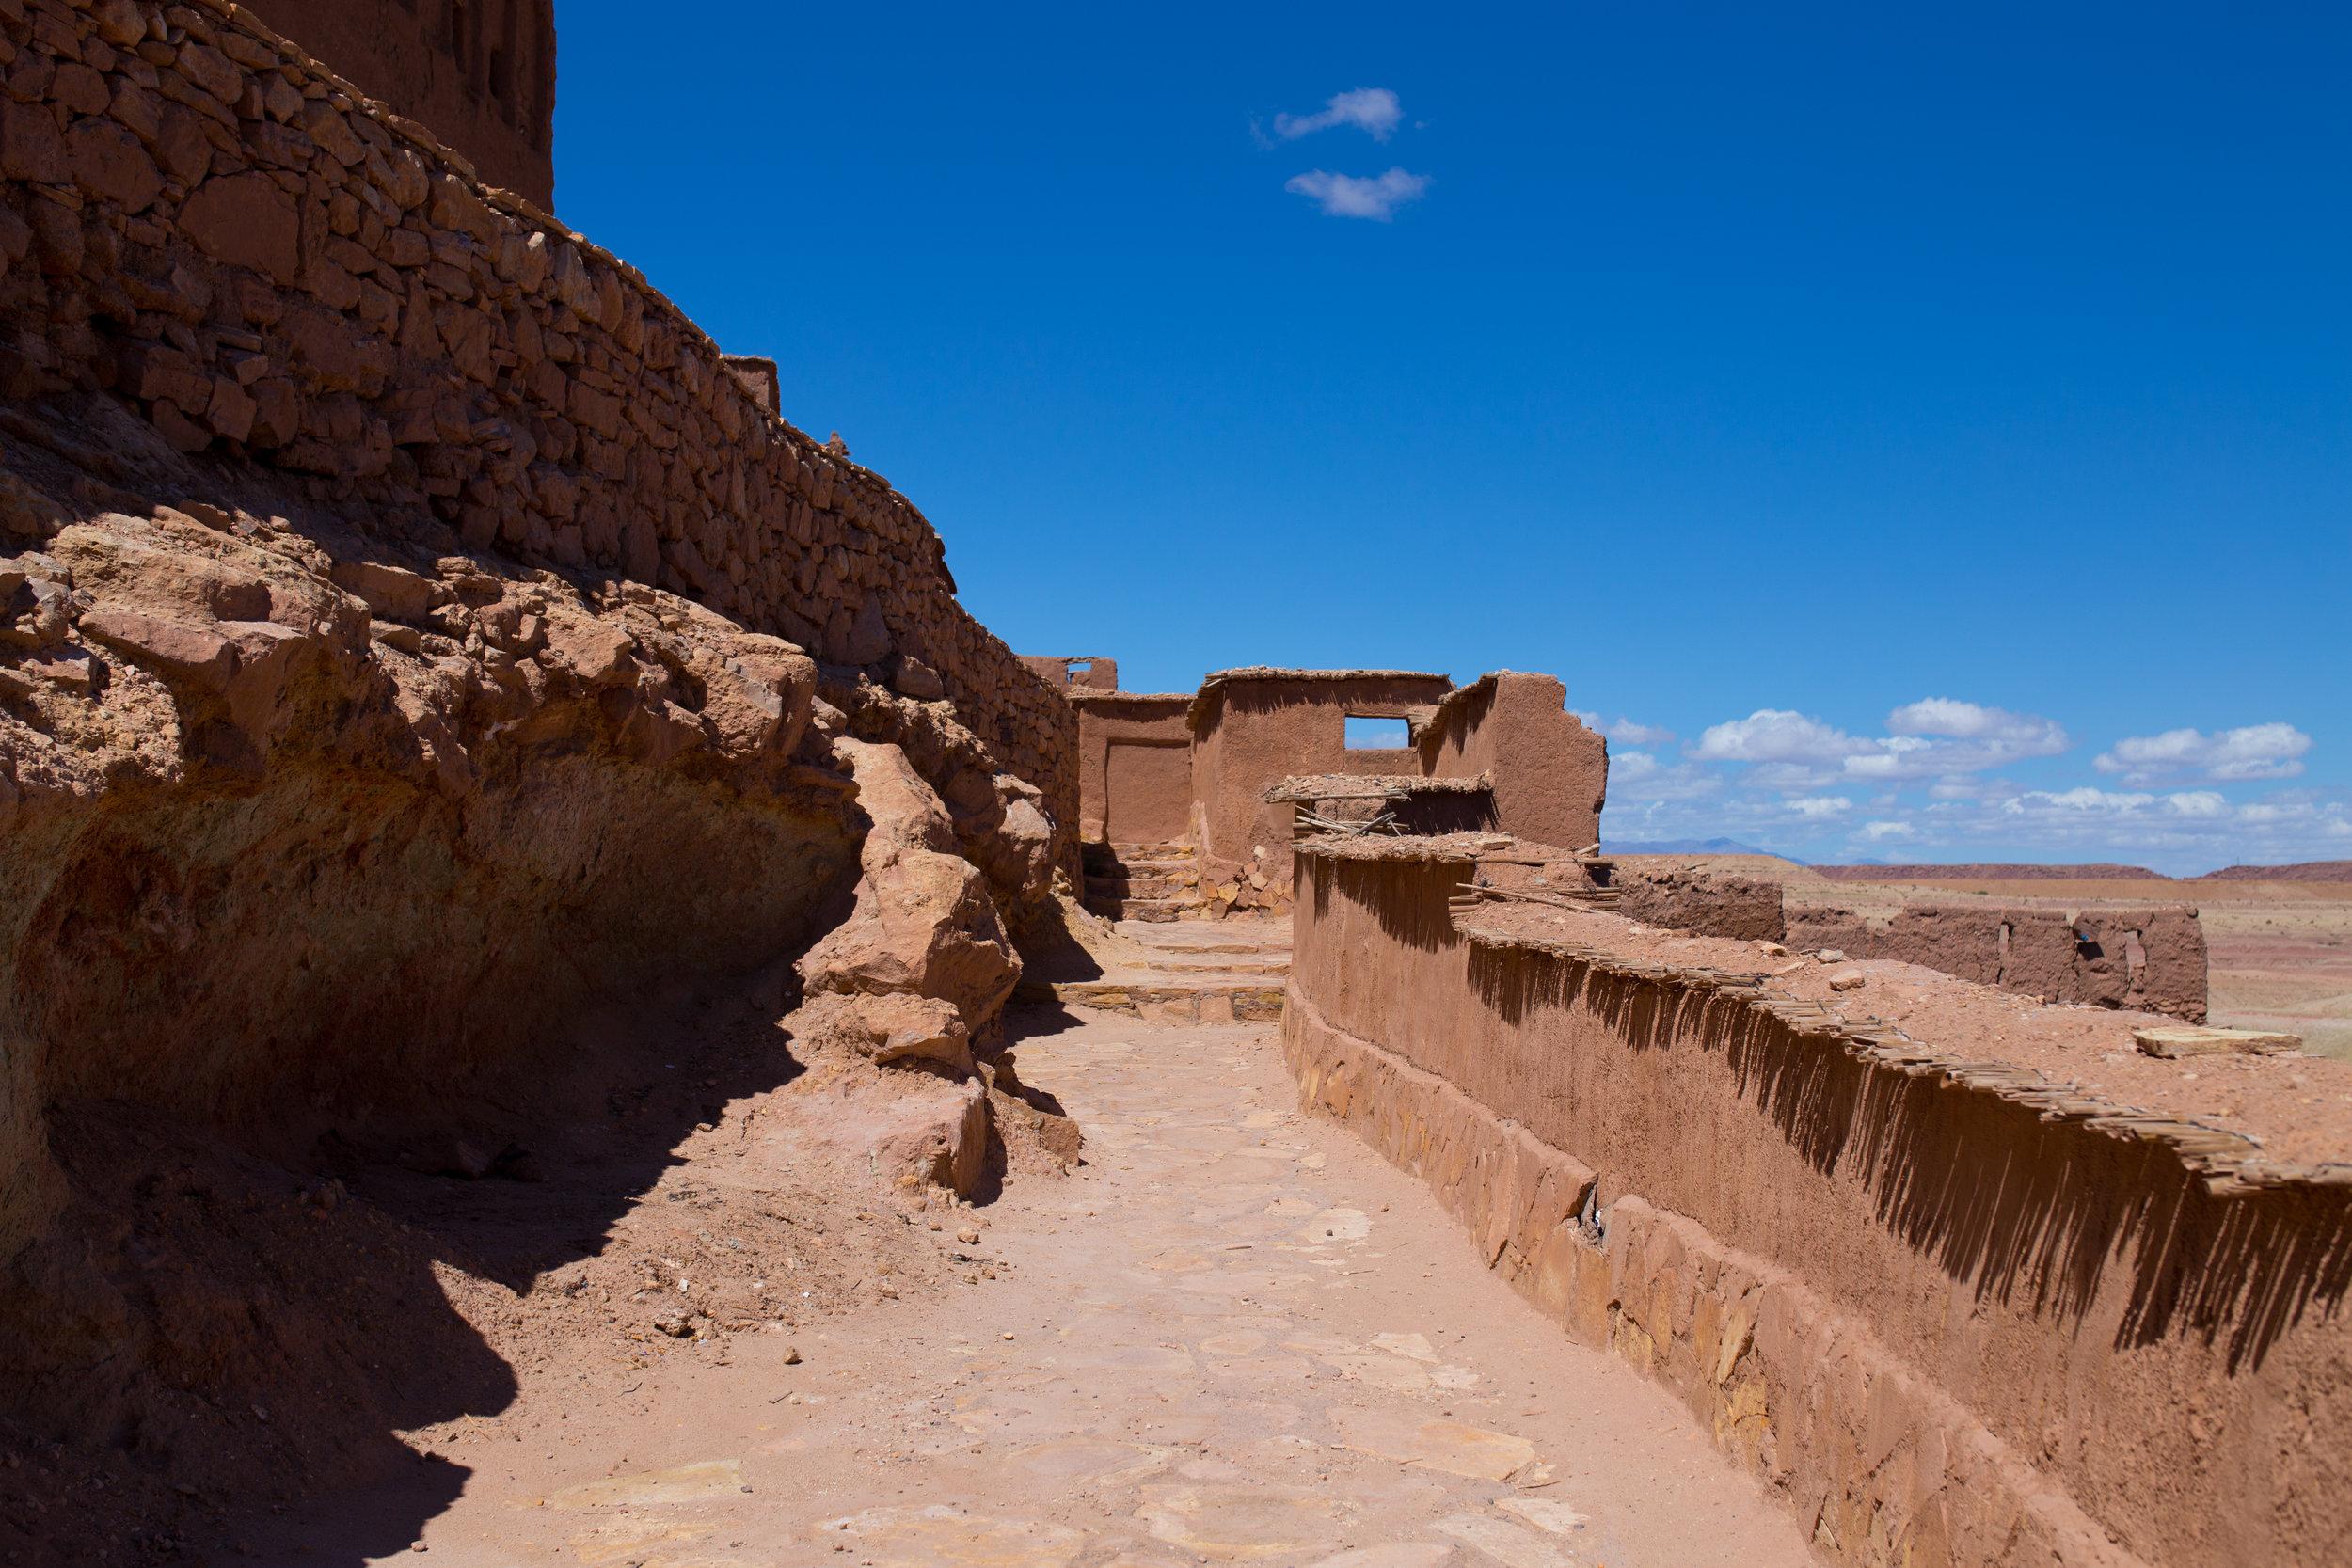 morocco-morocco travel-visit morocco-travel-travel photography-travel photographer-alina mendoza-alina mendoza photography-39.jpg